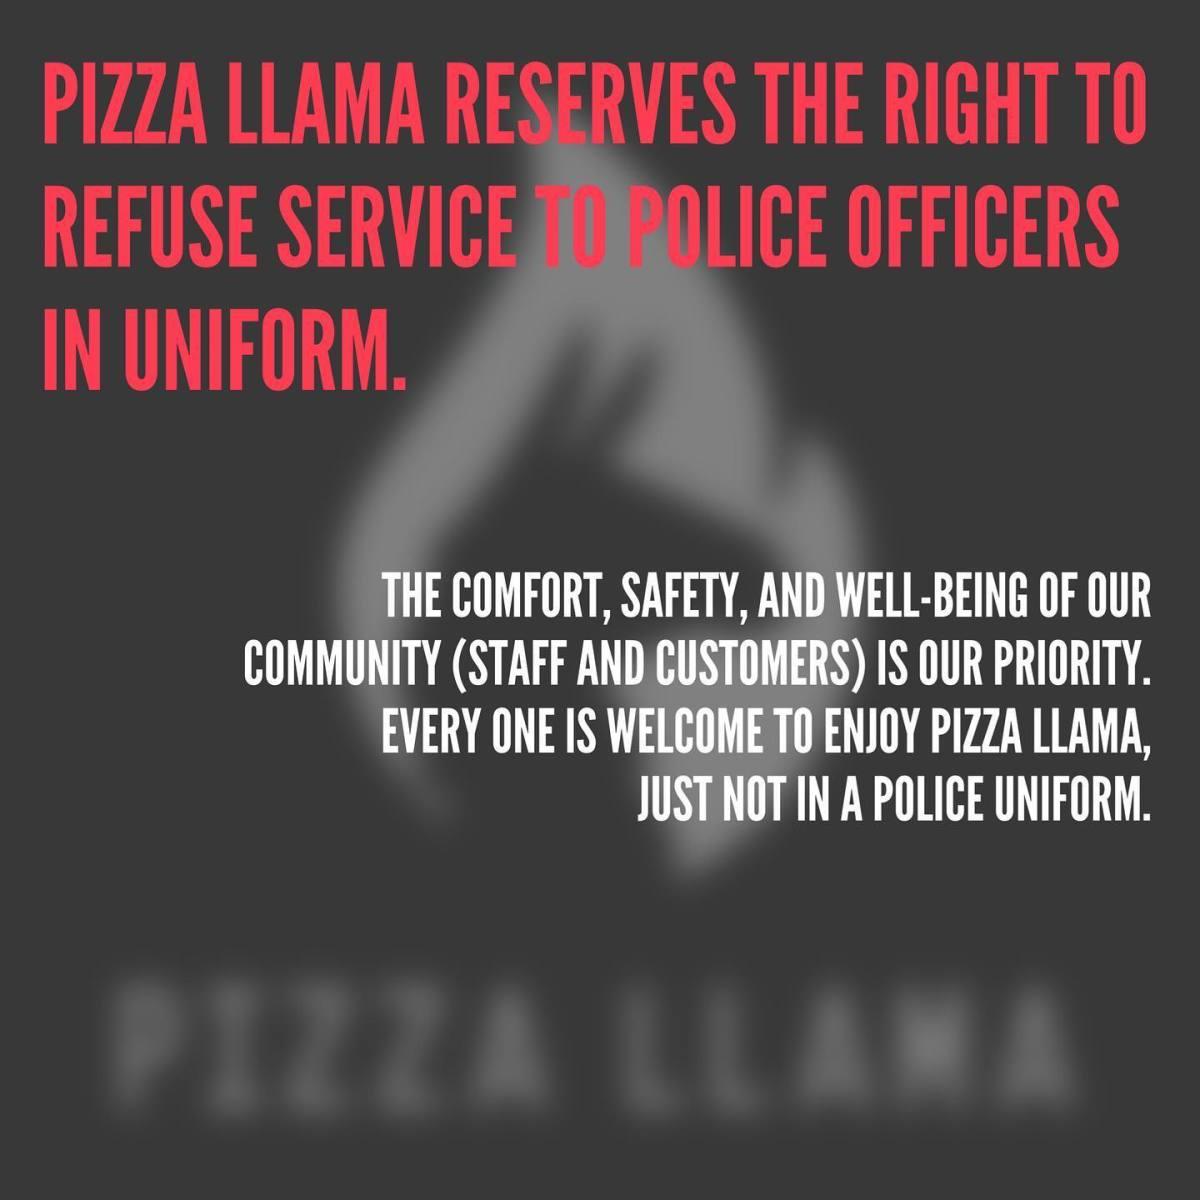 Photo Credit: Facebook/Pizza Llama